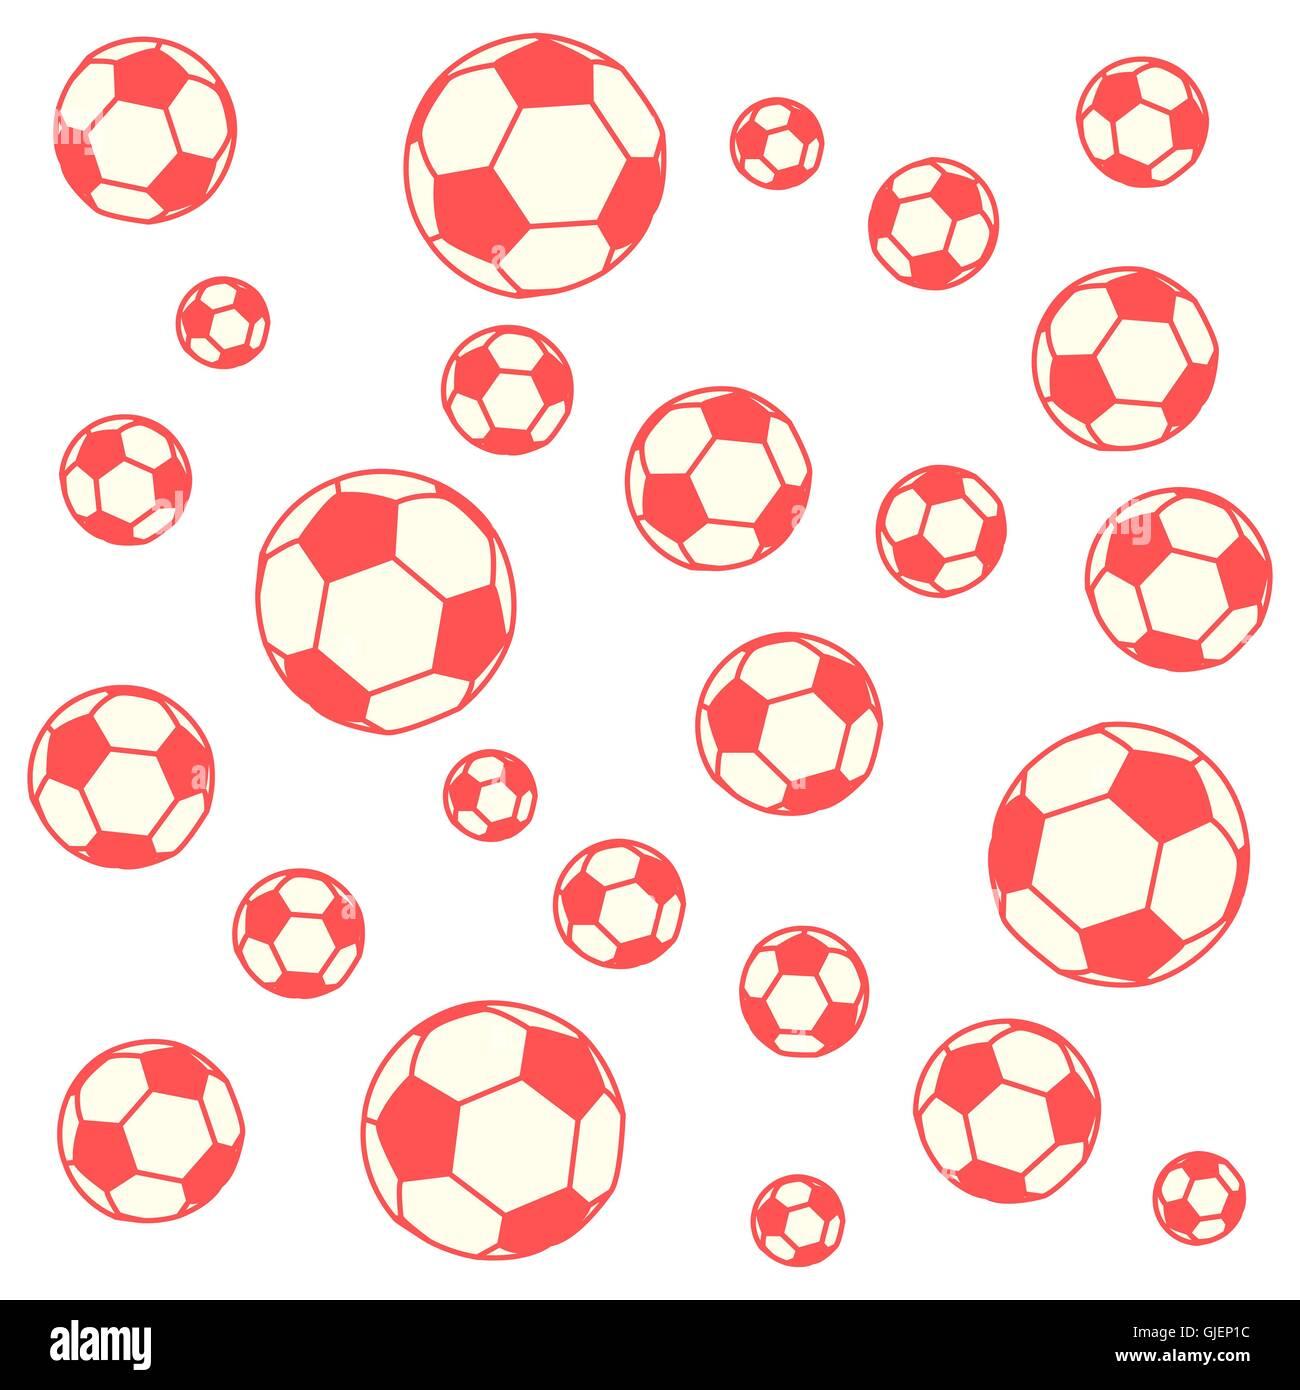 Bonita imagen de coloridas pelotas de fútbol sobre un fondo de color ... d7075bbaab626